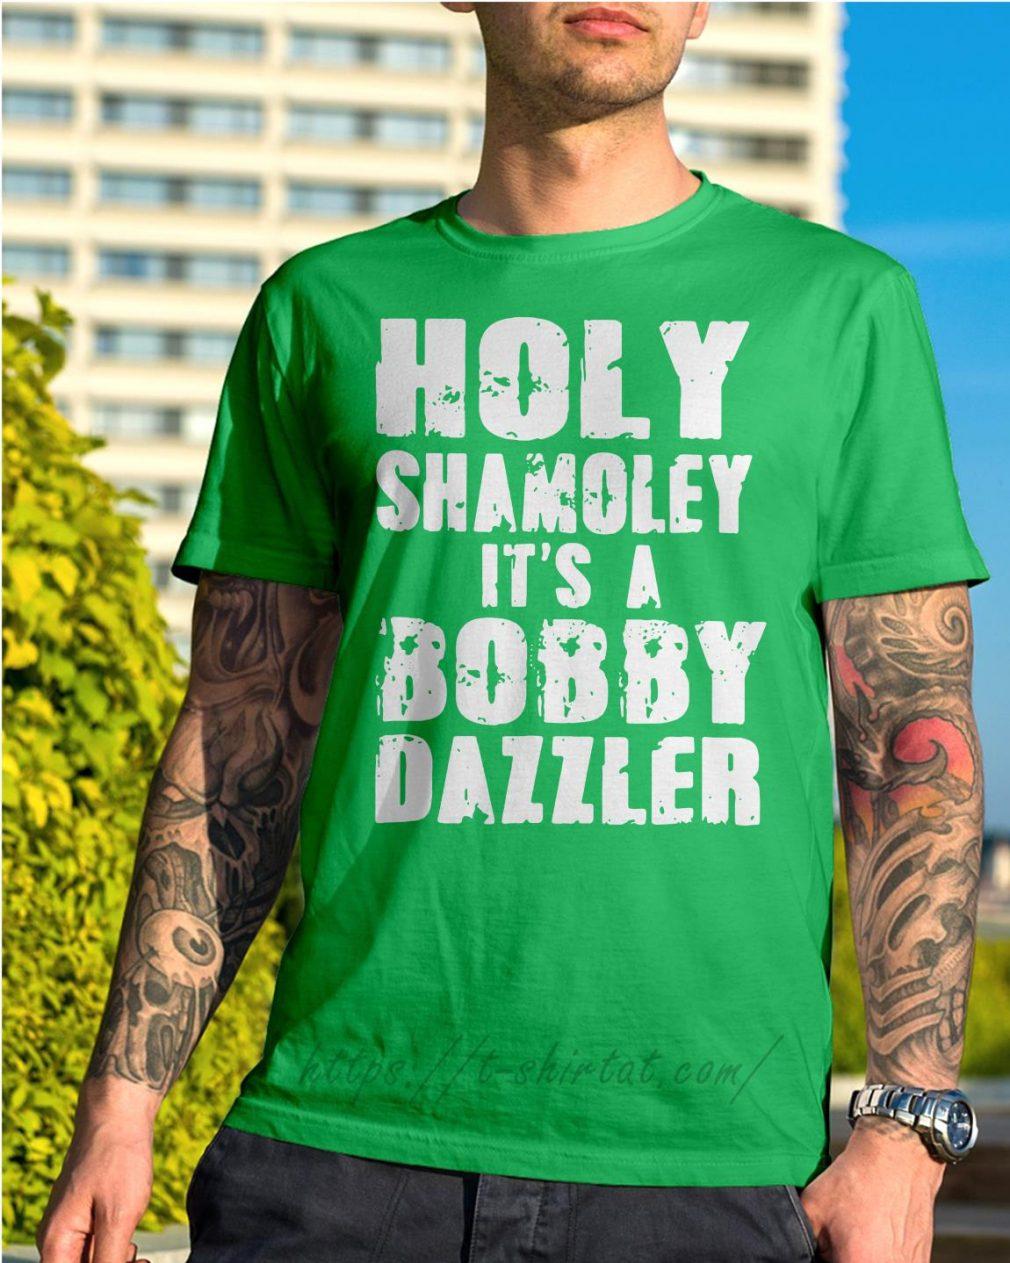 Holy shamoley it's a bobby dazzler Shirt Green